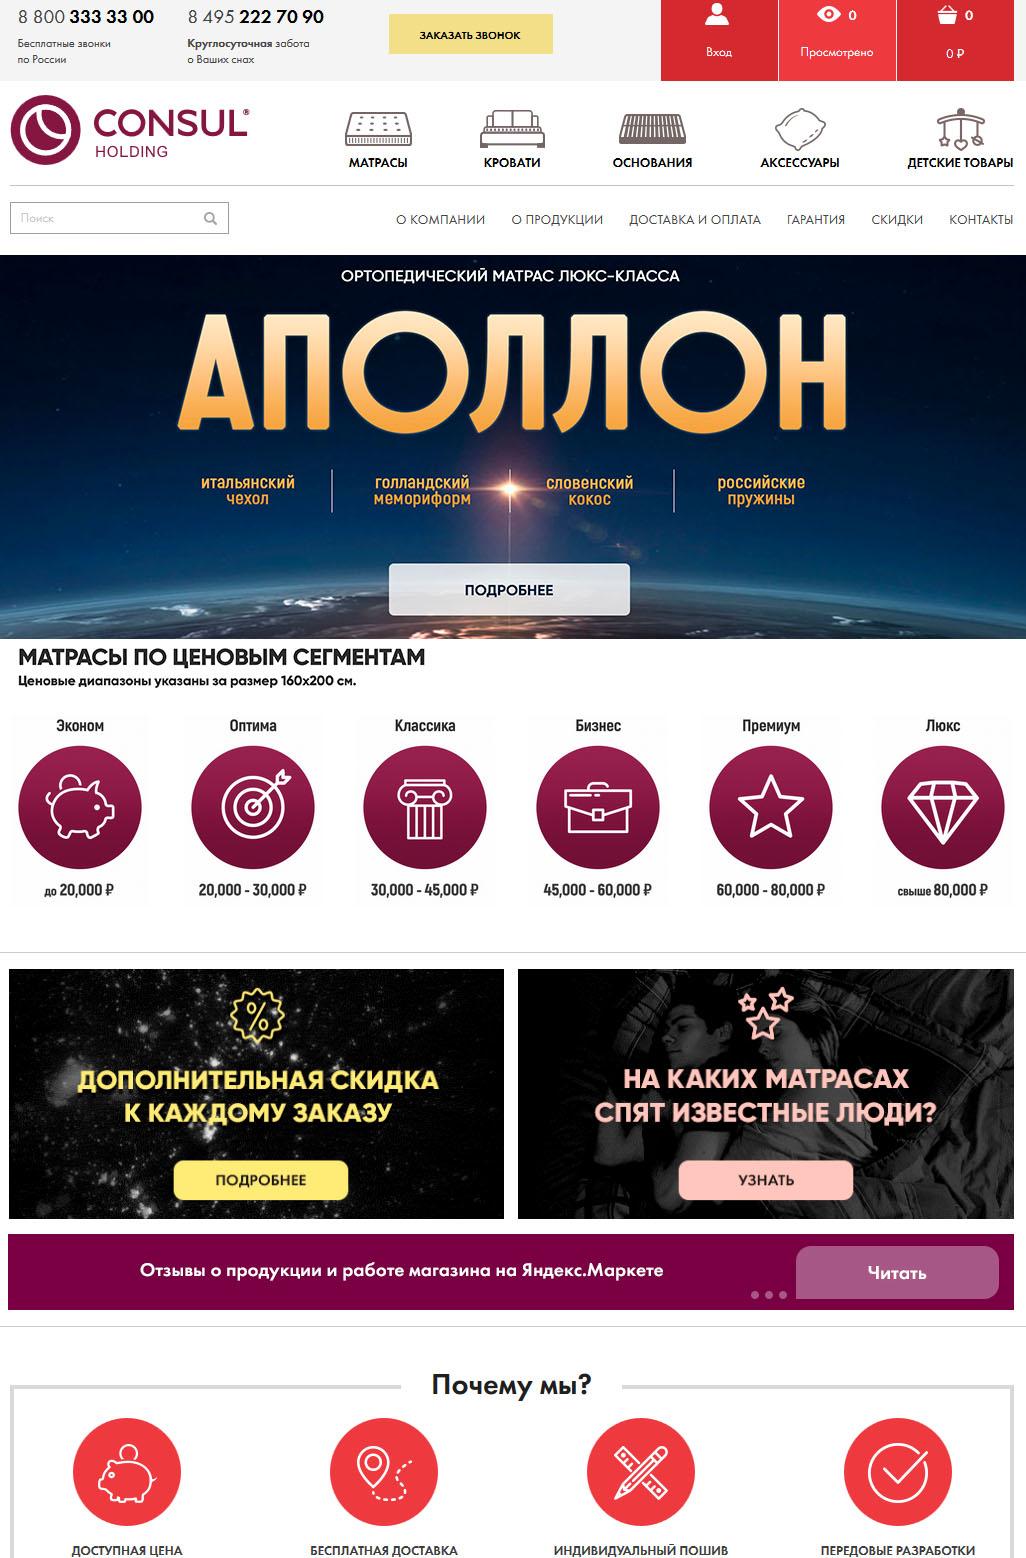 Интернет-магазин Консул